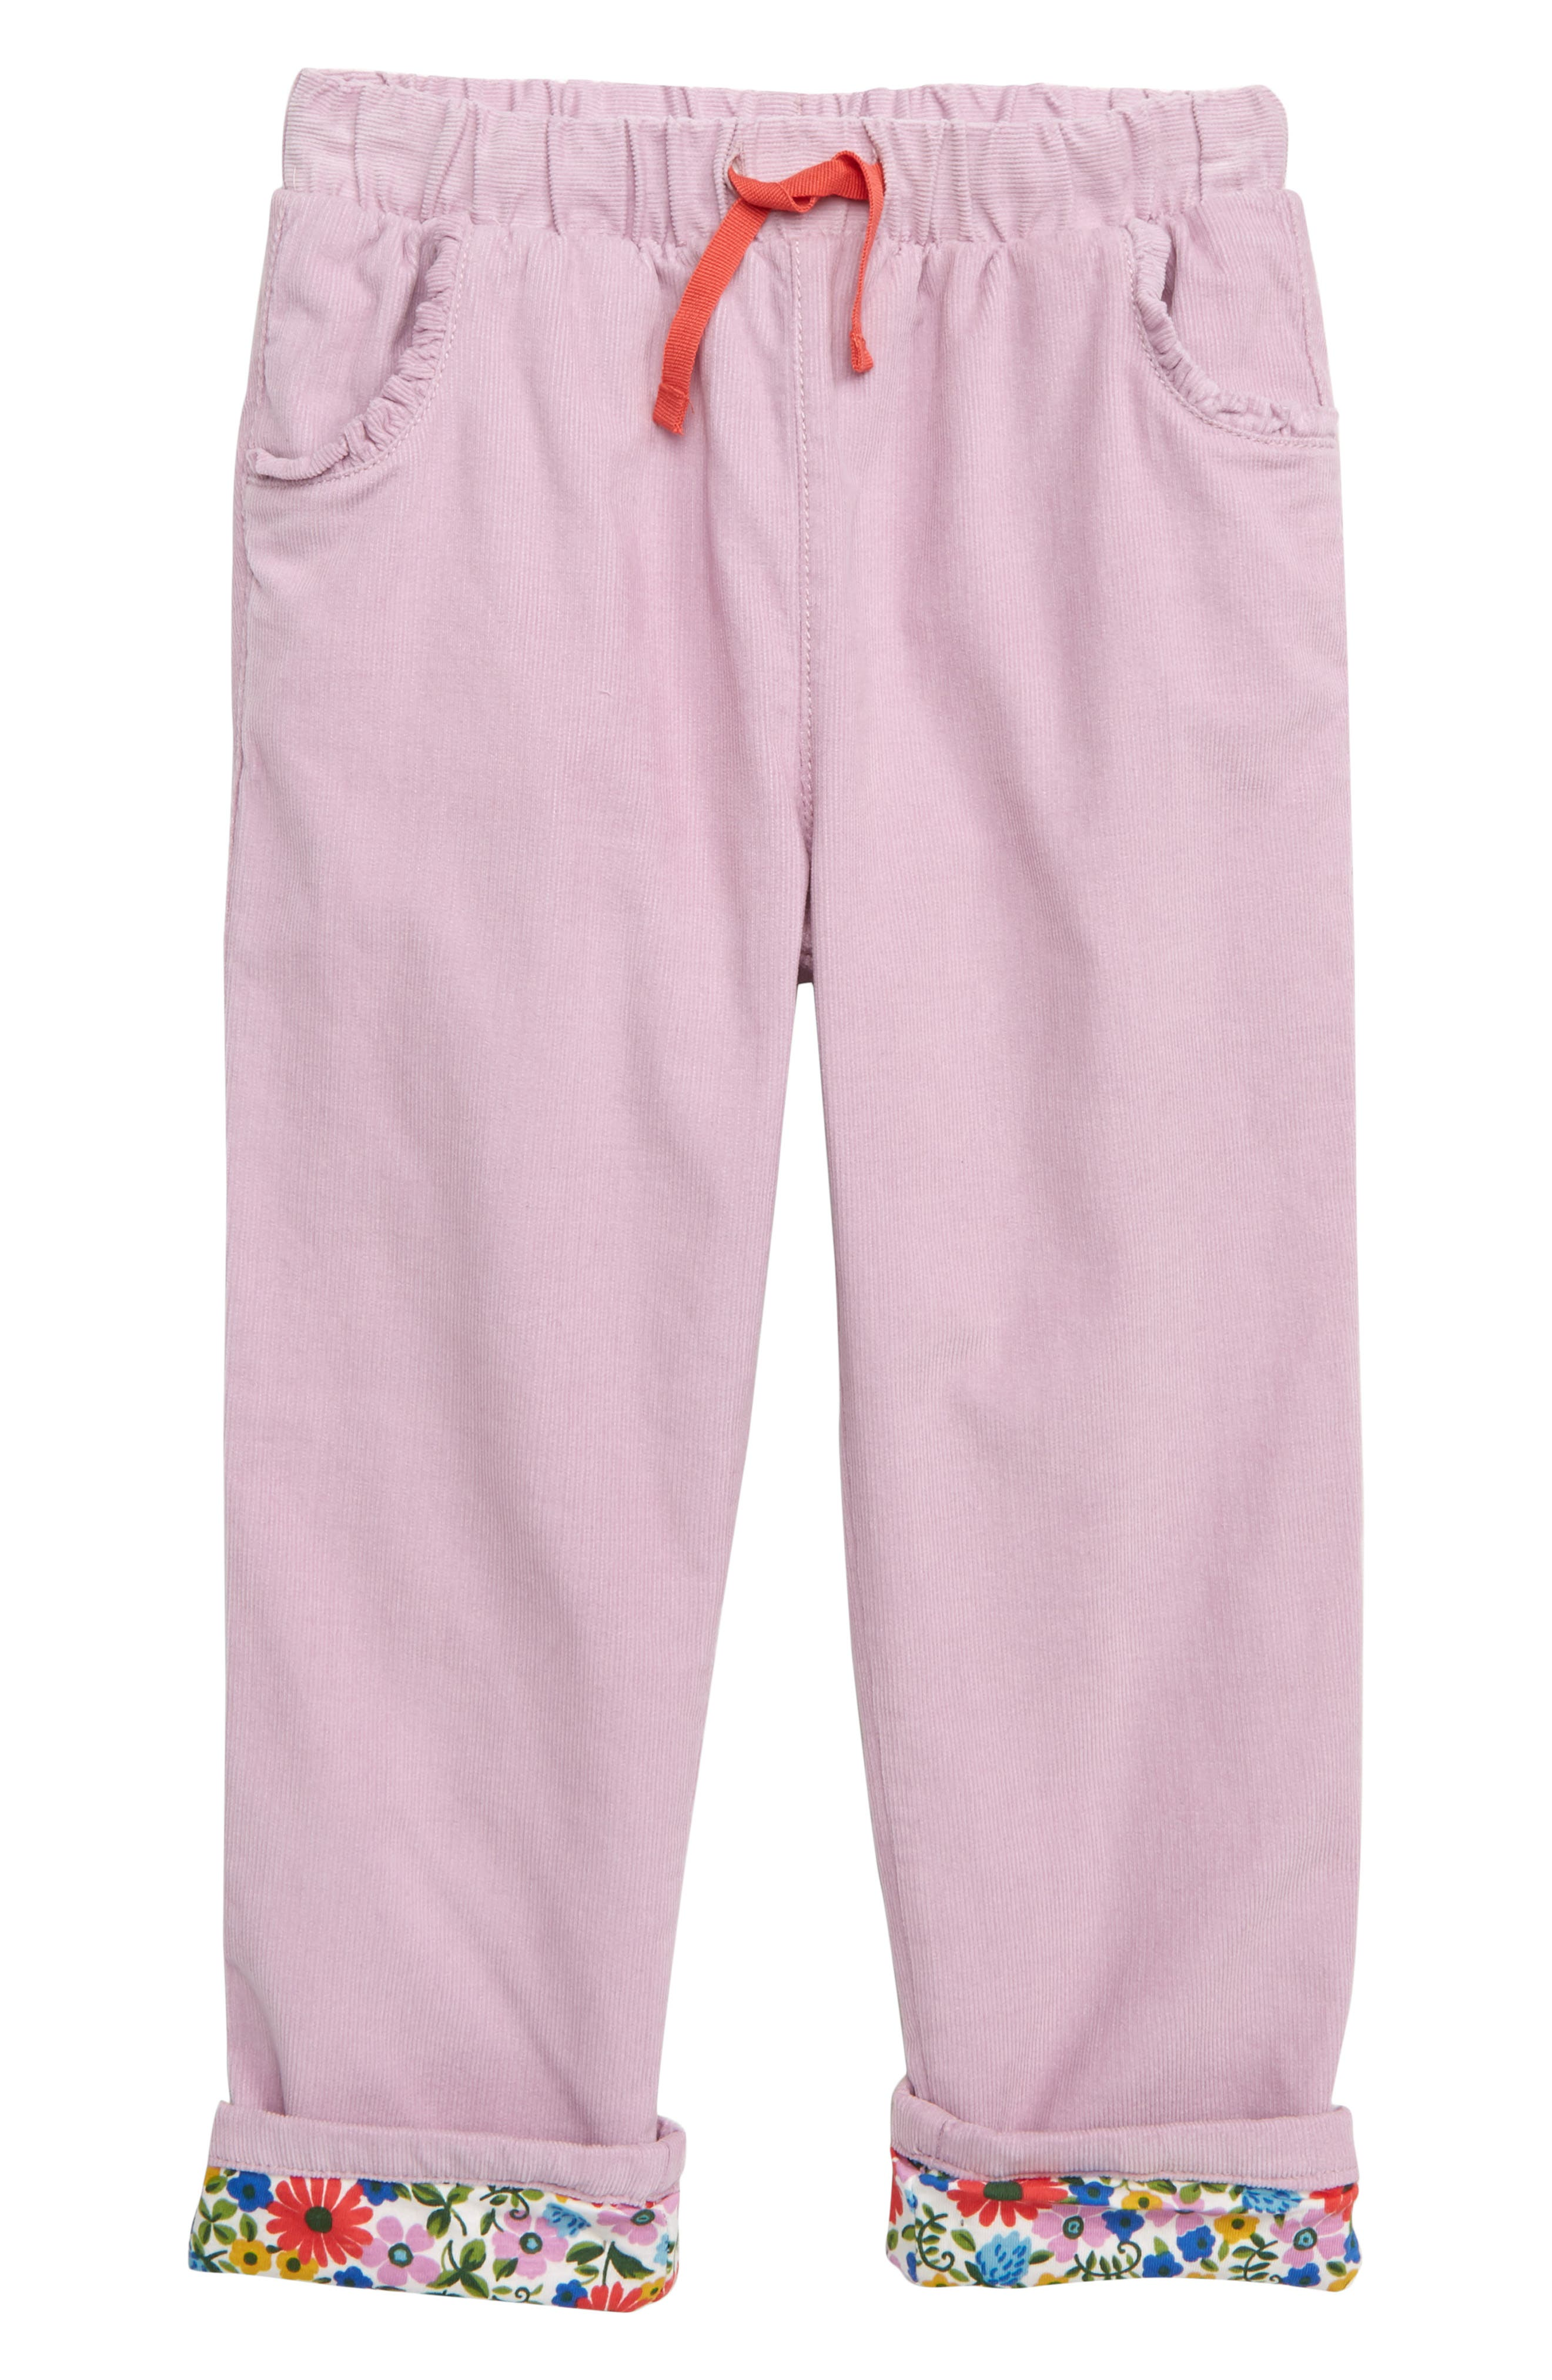 MINI BODEN, Pretty Pocket Corduroy Pants, Main thumbnail 1, color, DELPHINIUM PURPLE STRAWBERRY